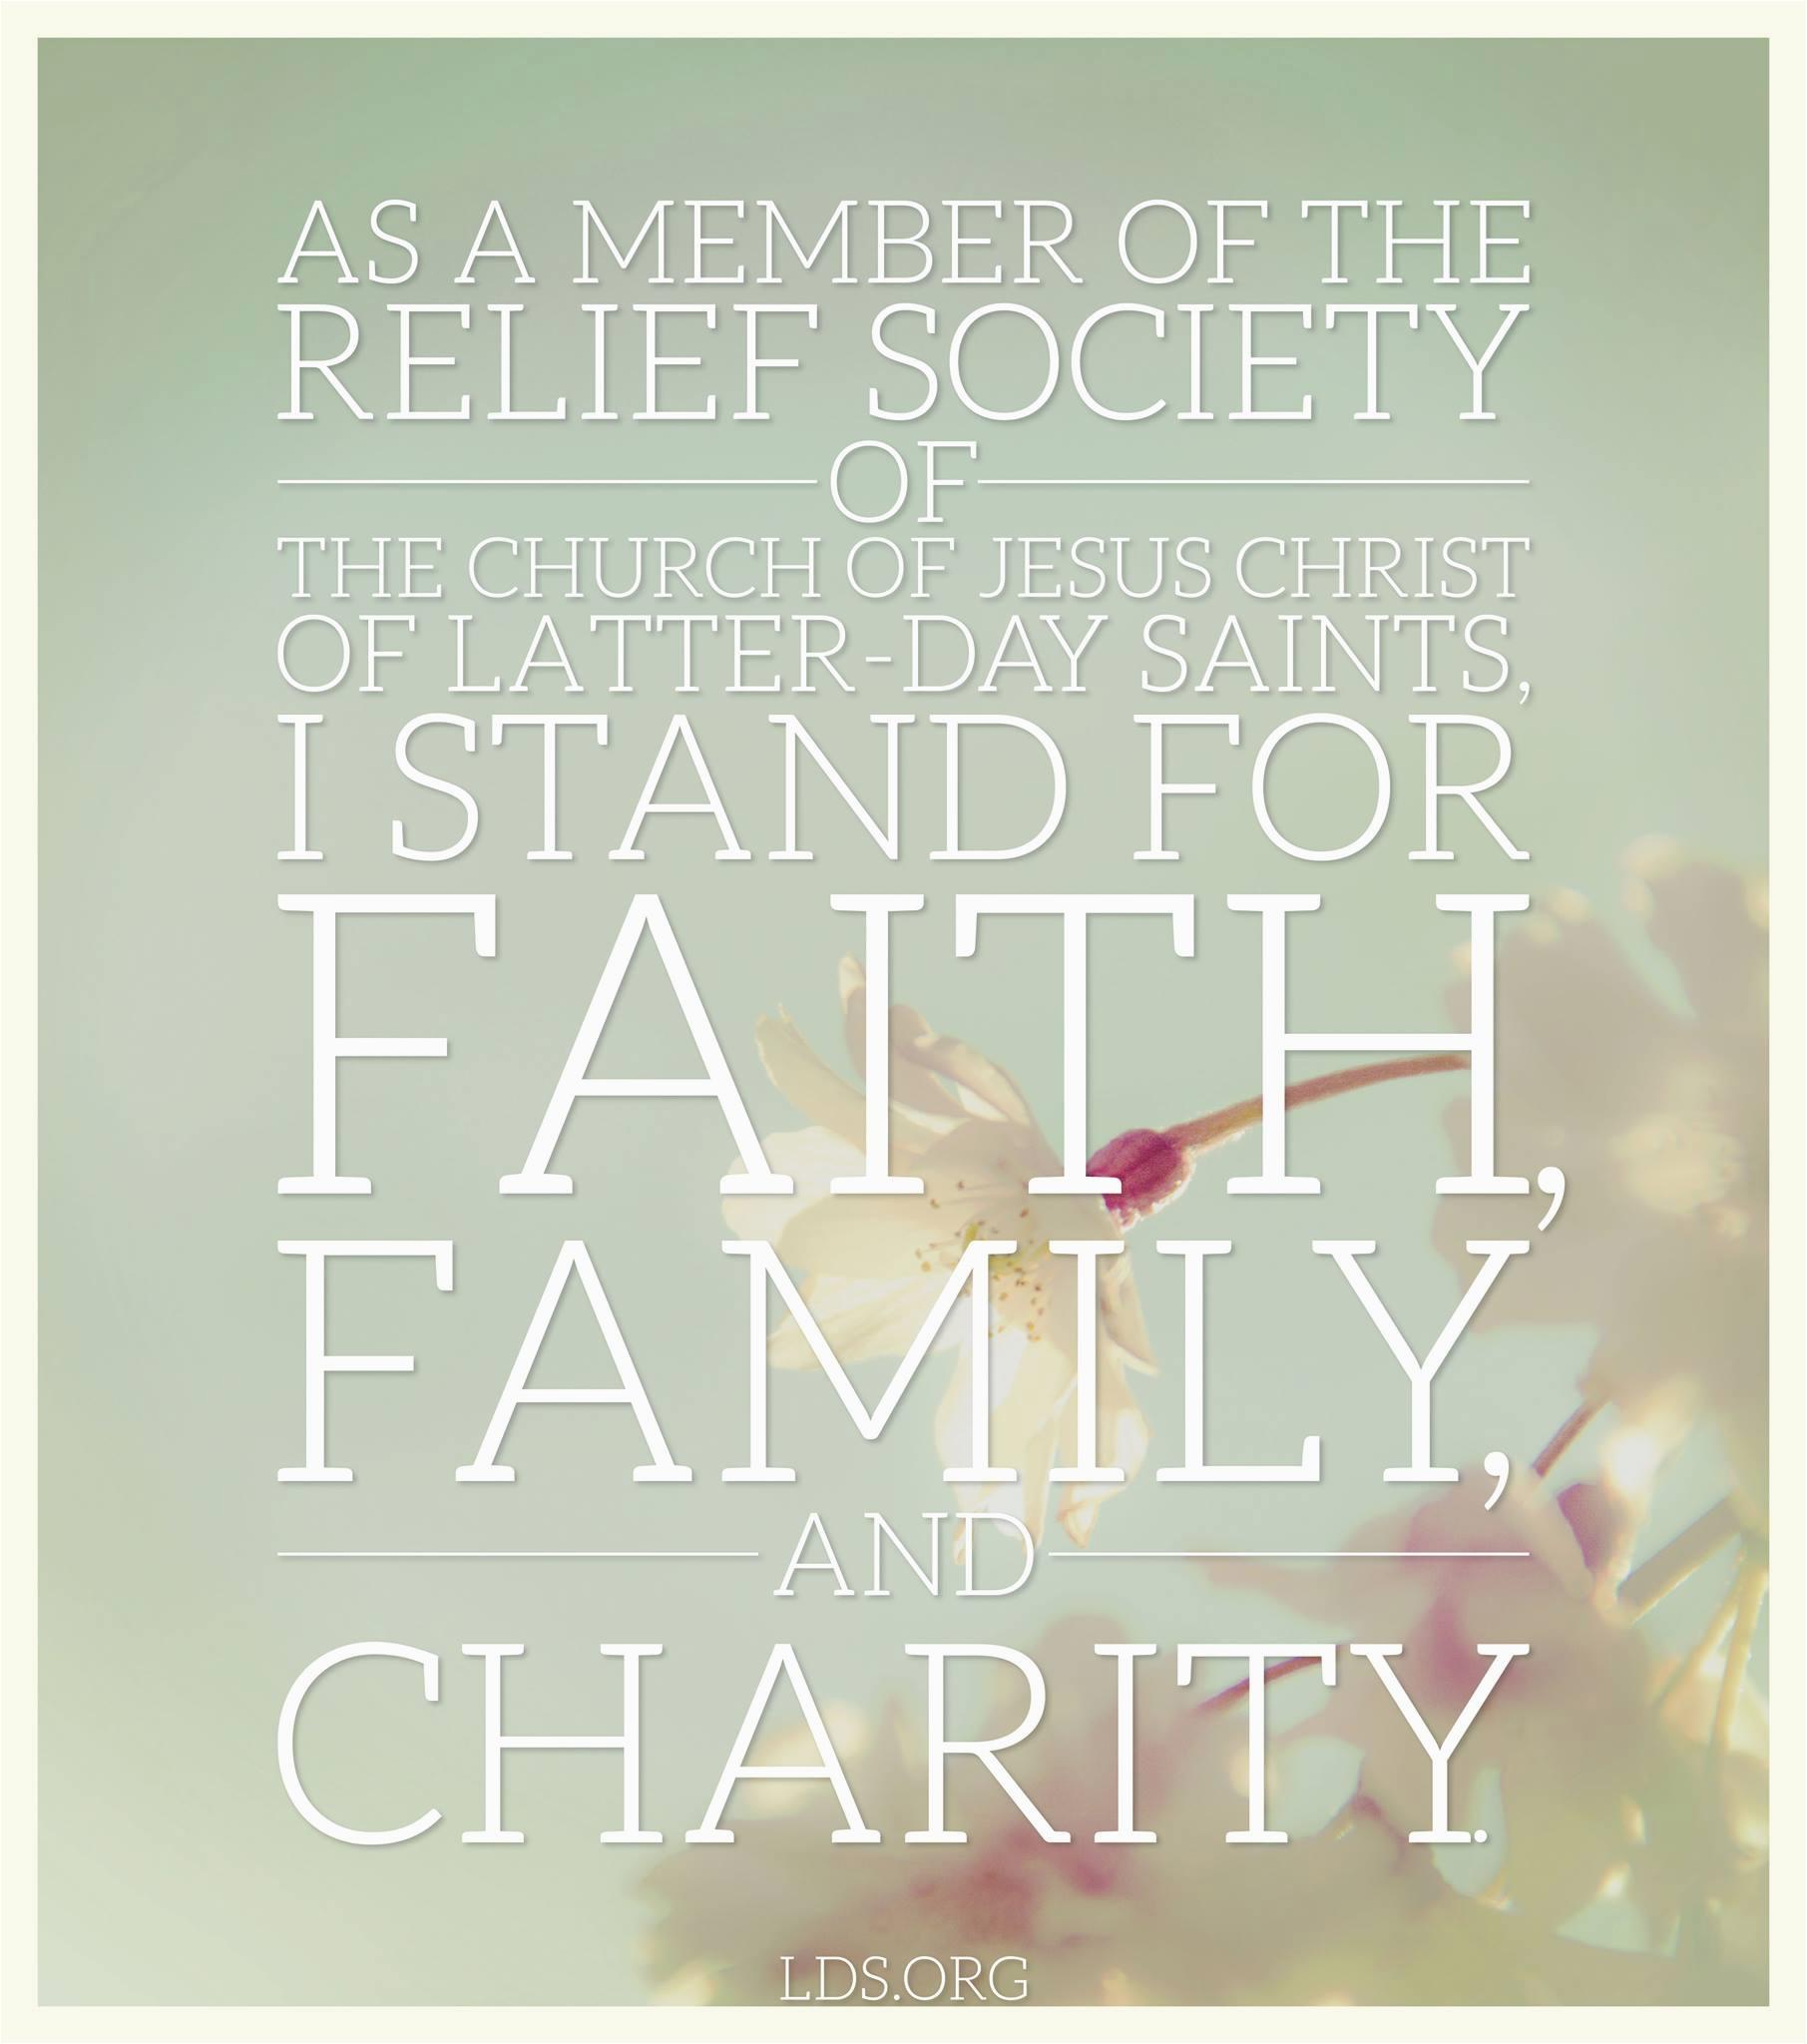 happy 172nd birthday relief society